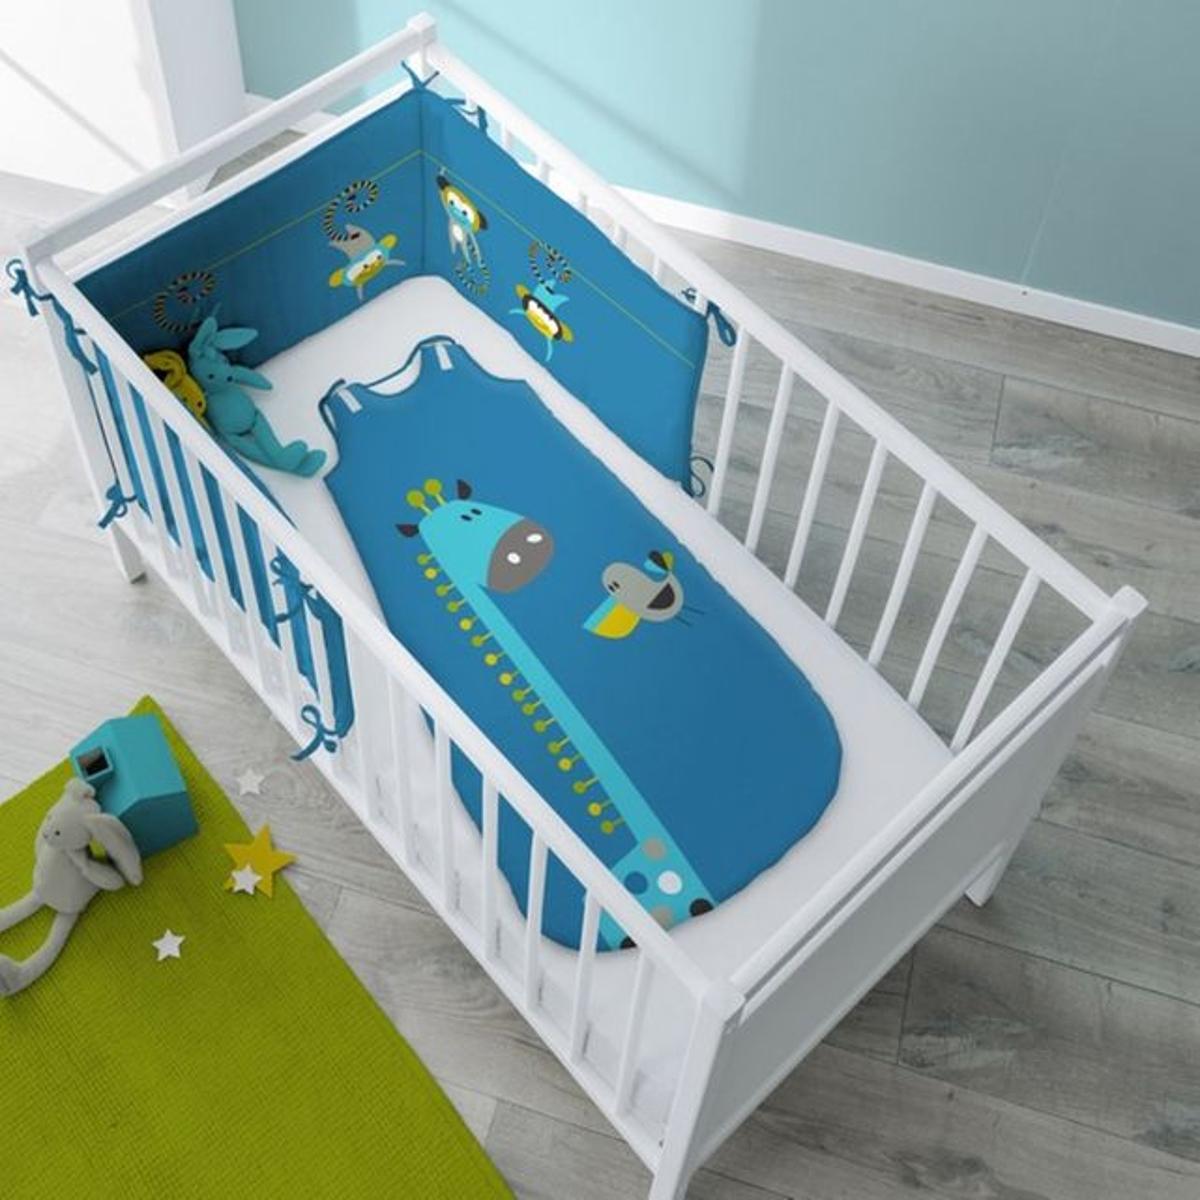 Turbulette girafe bleu pour bébé en coton - Cocoloco